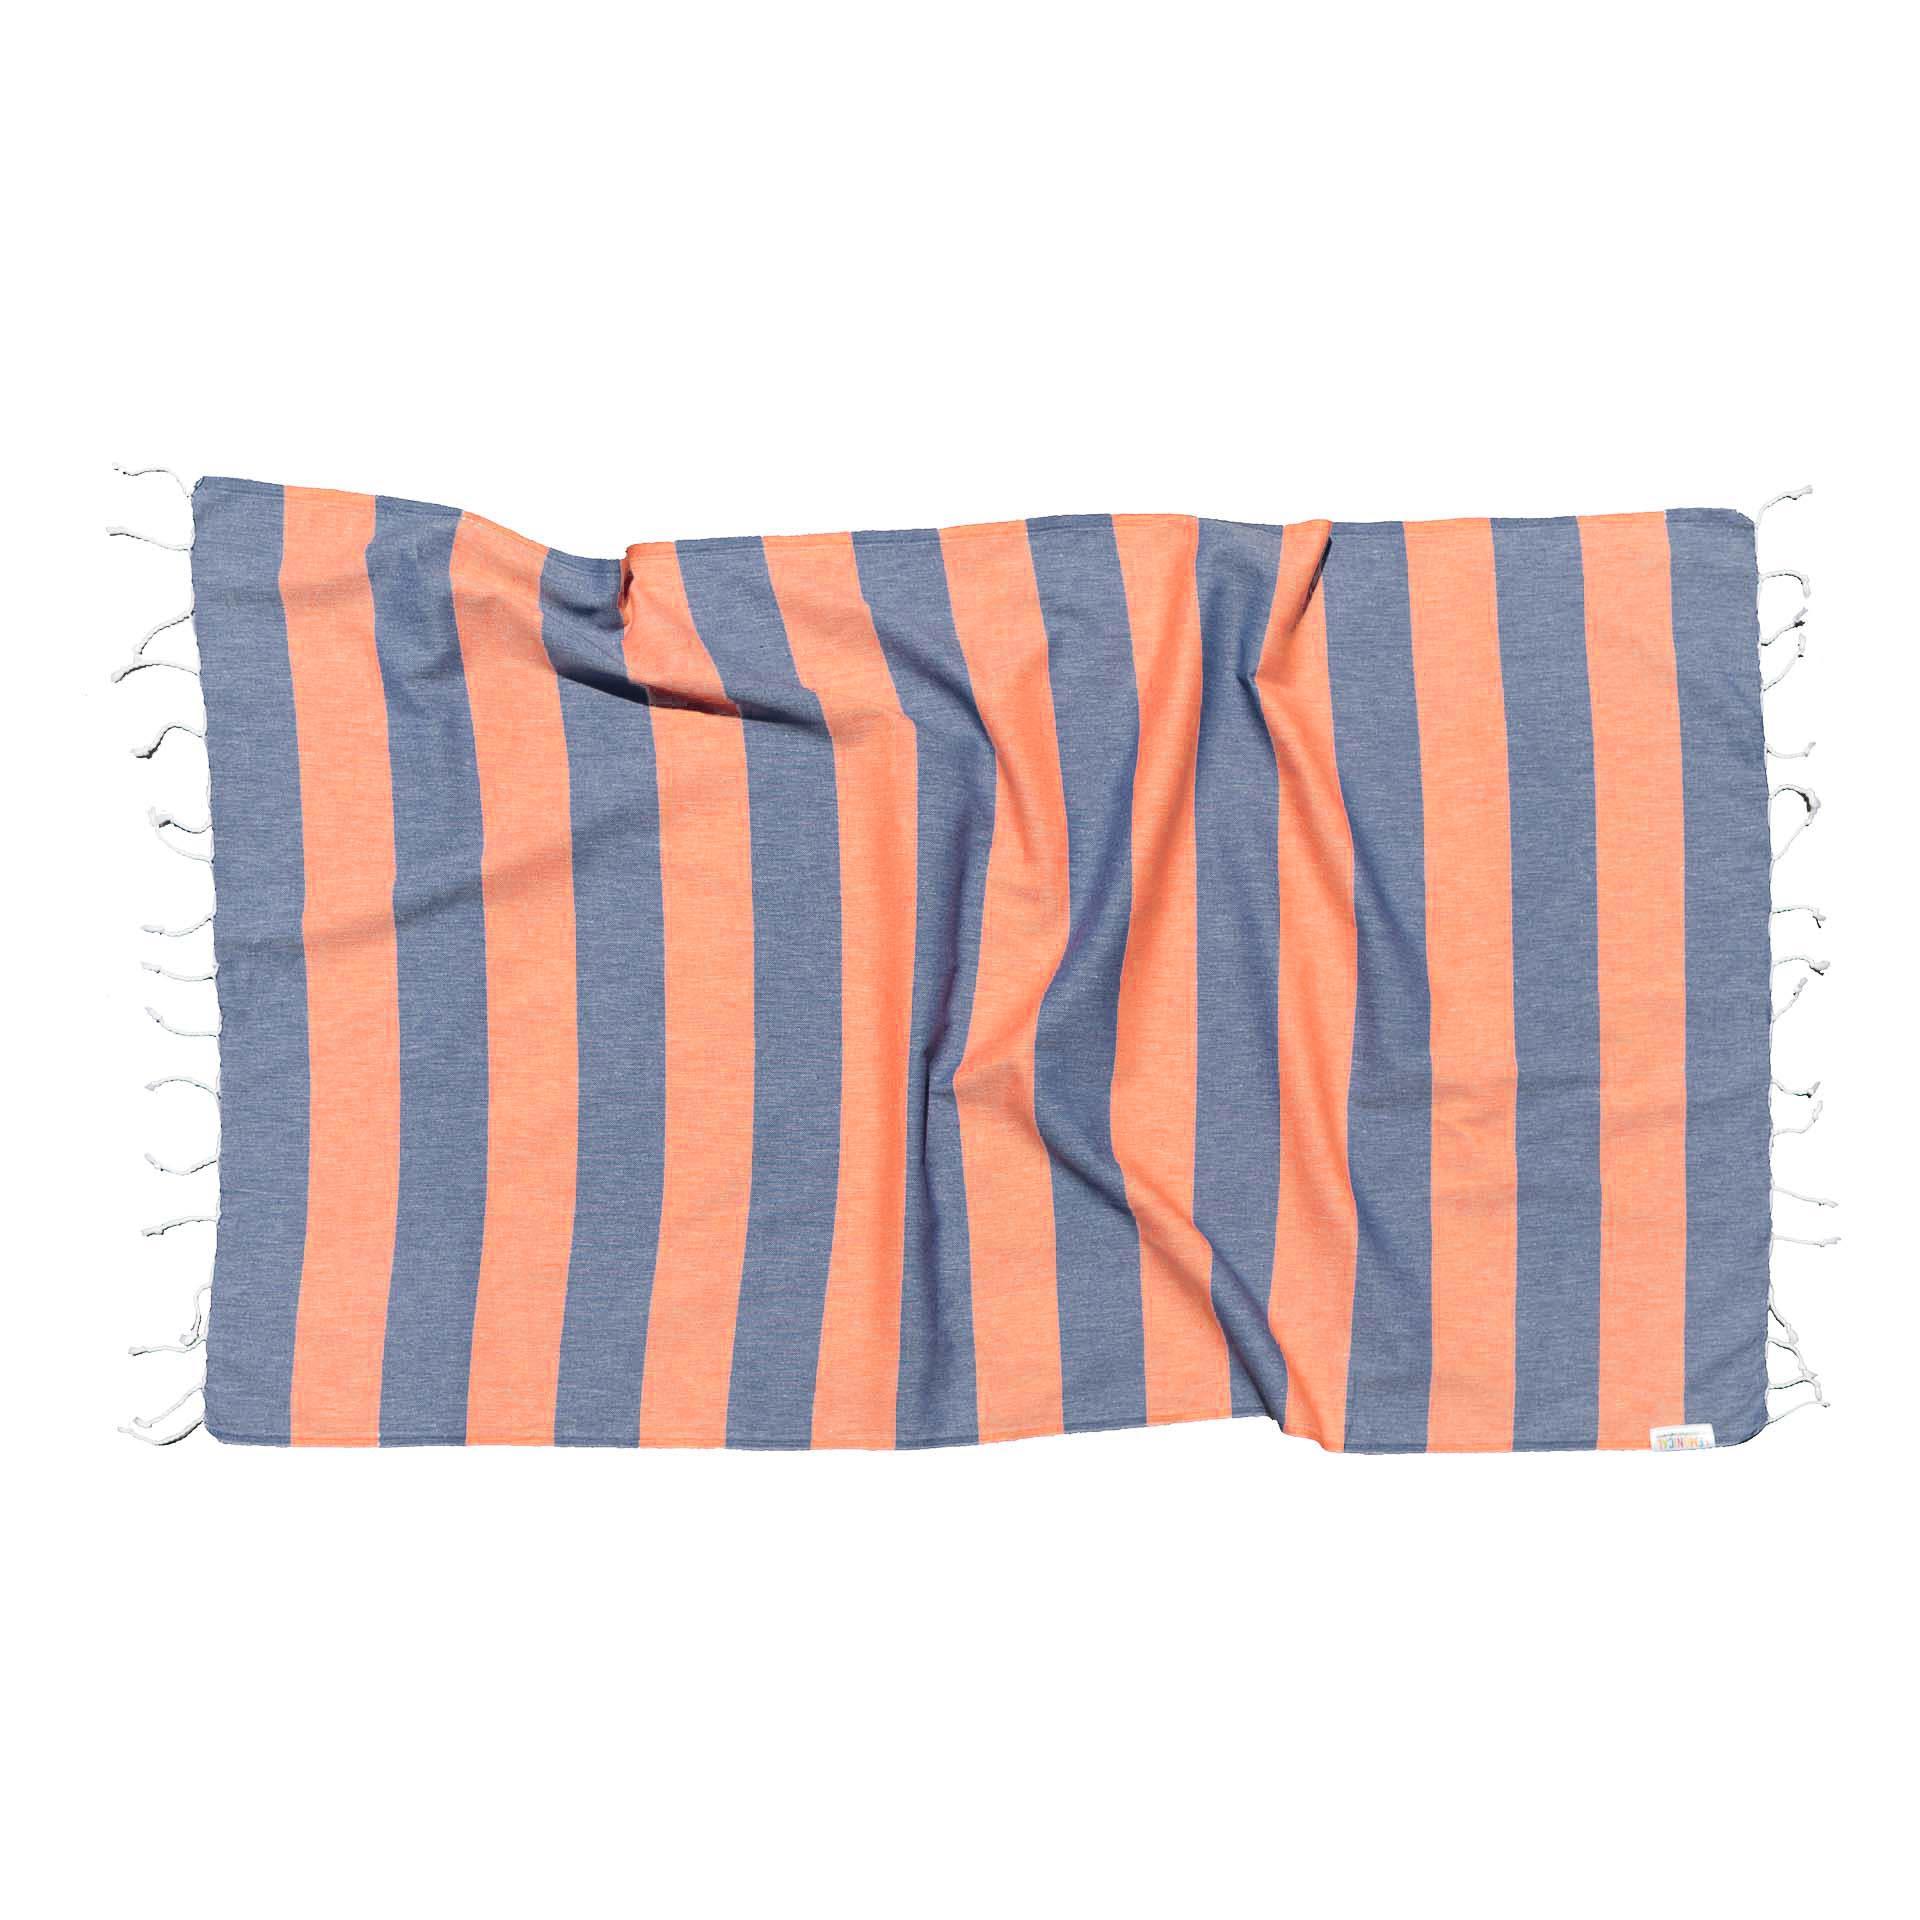 FIREFOX Towel Lemonical-1